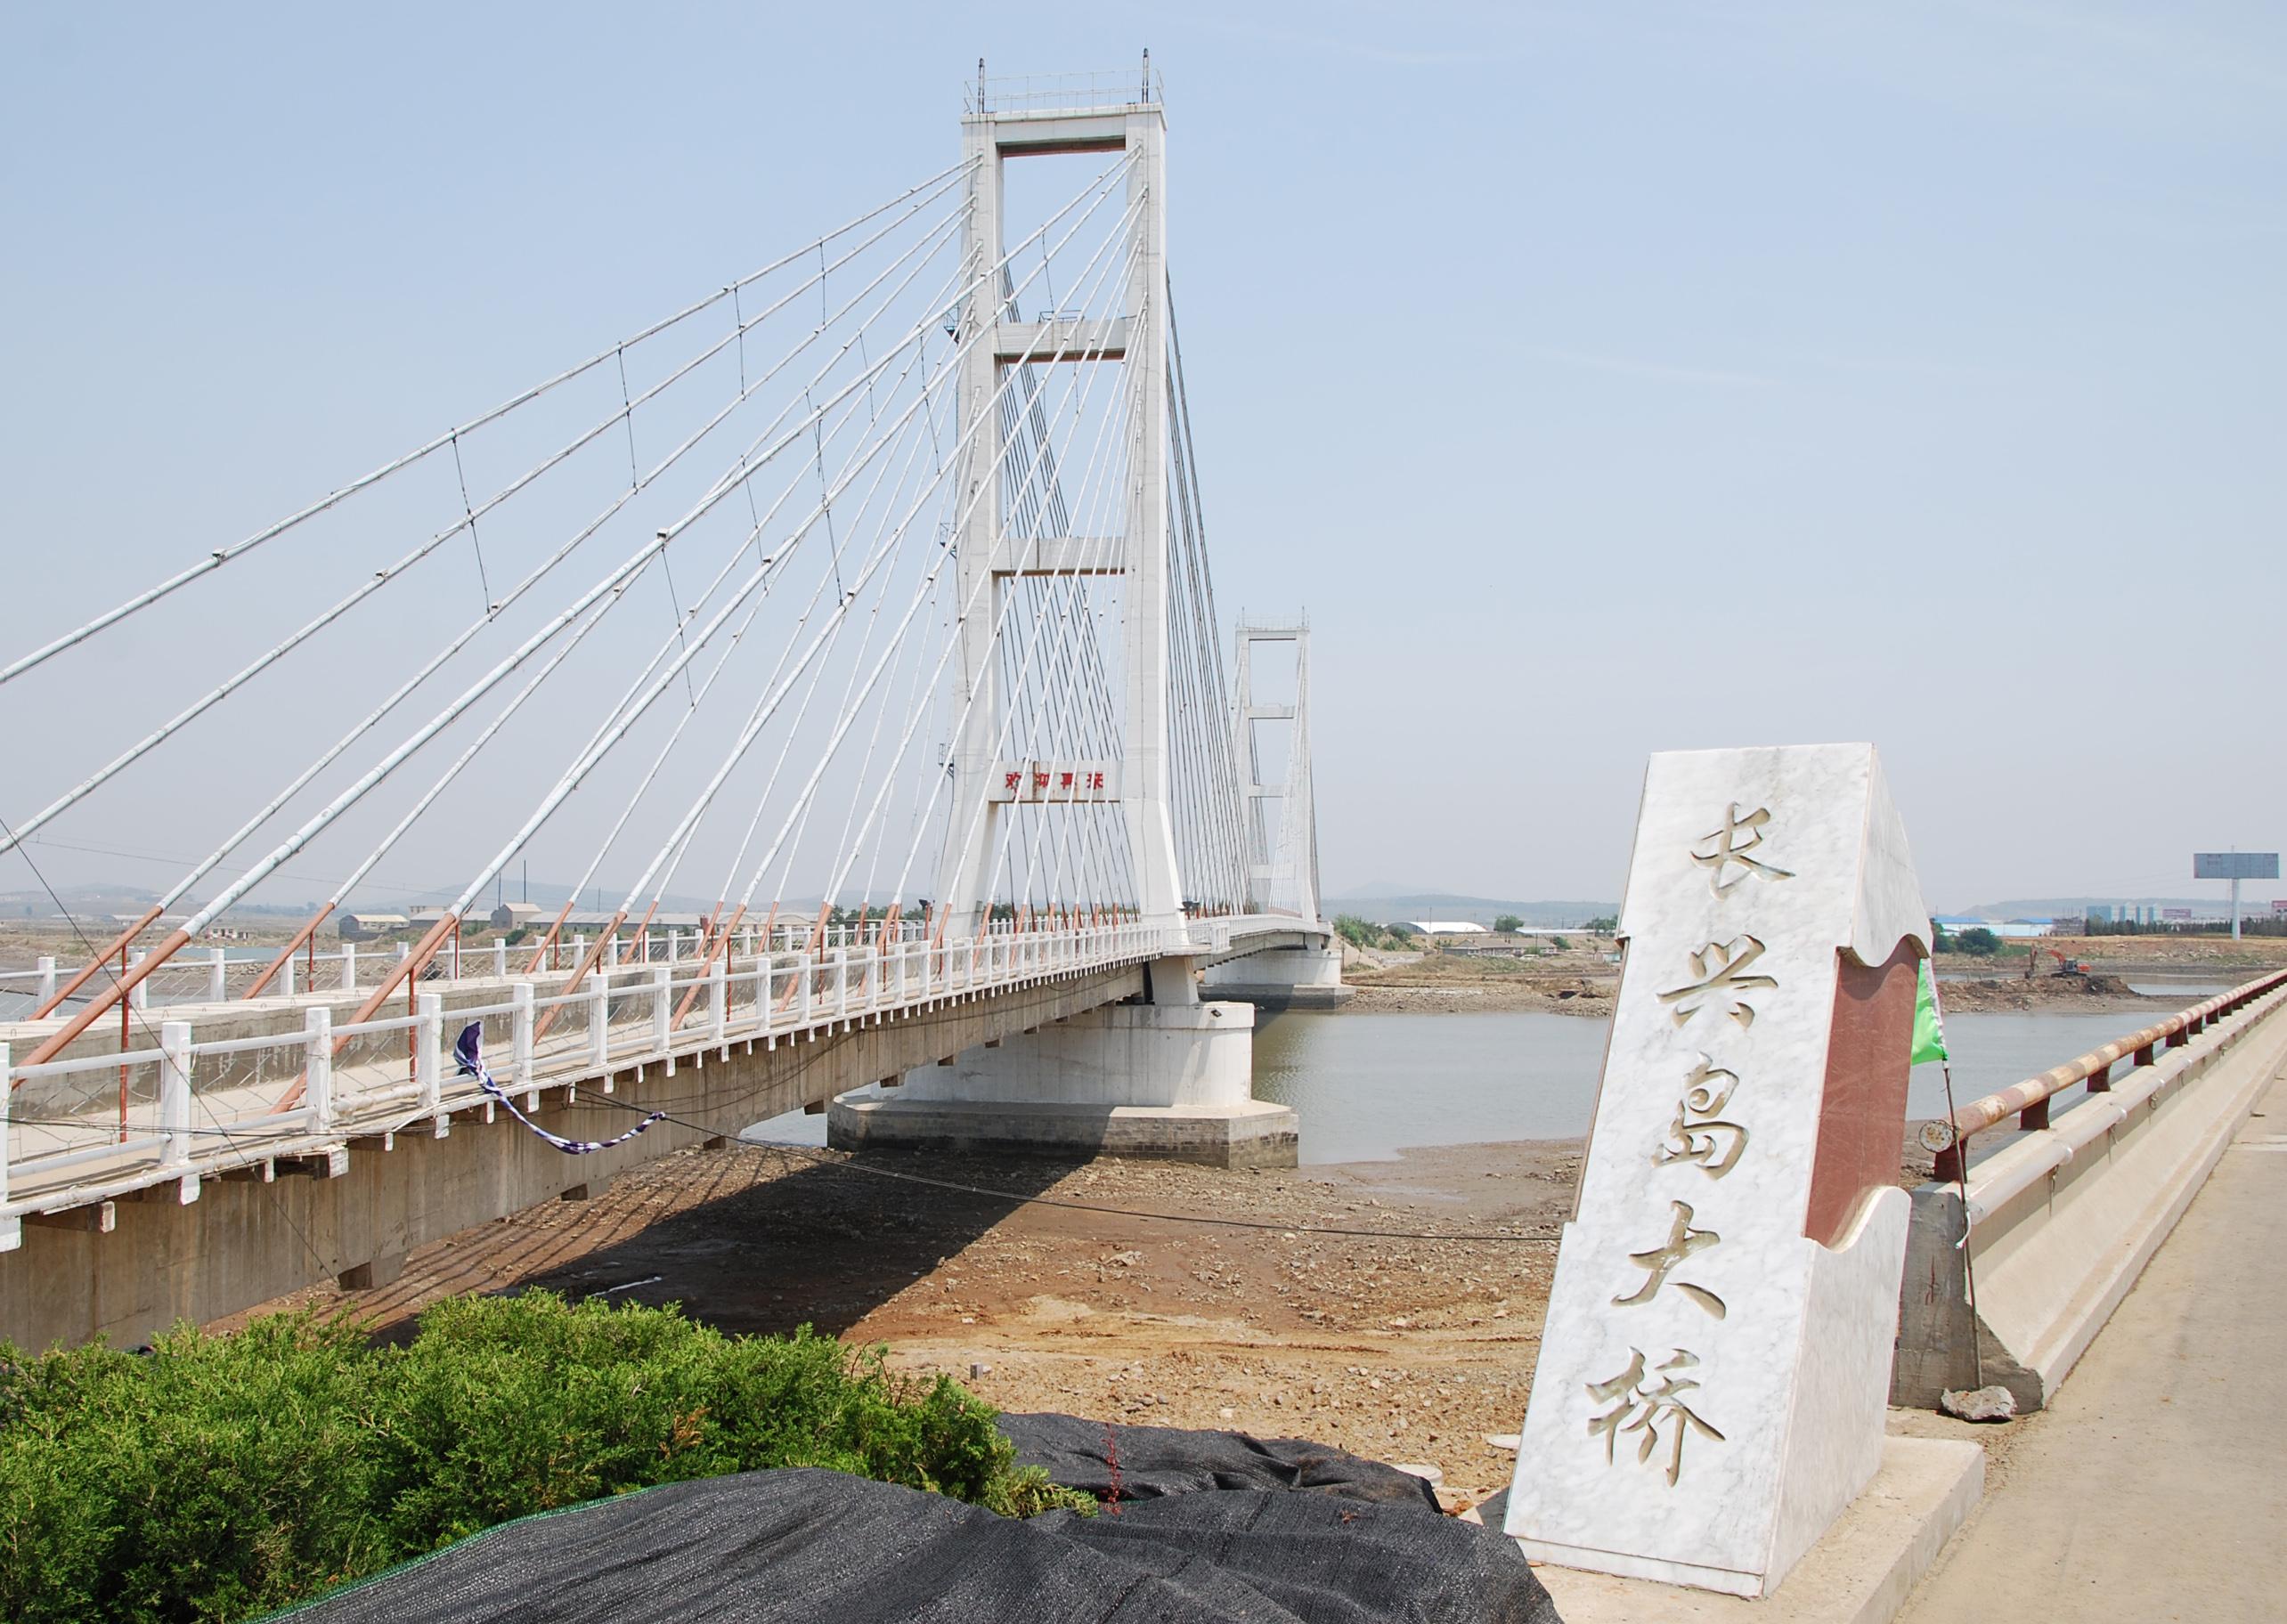 Dalian China  City pictures : Changxing Island Bridge, Dalian, China Wikimedia Commons